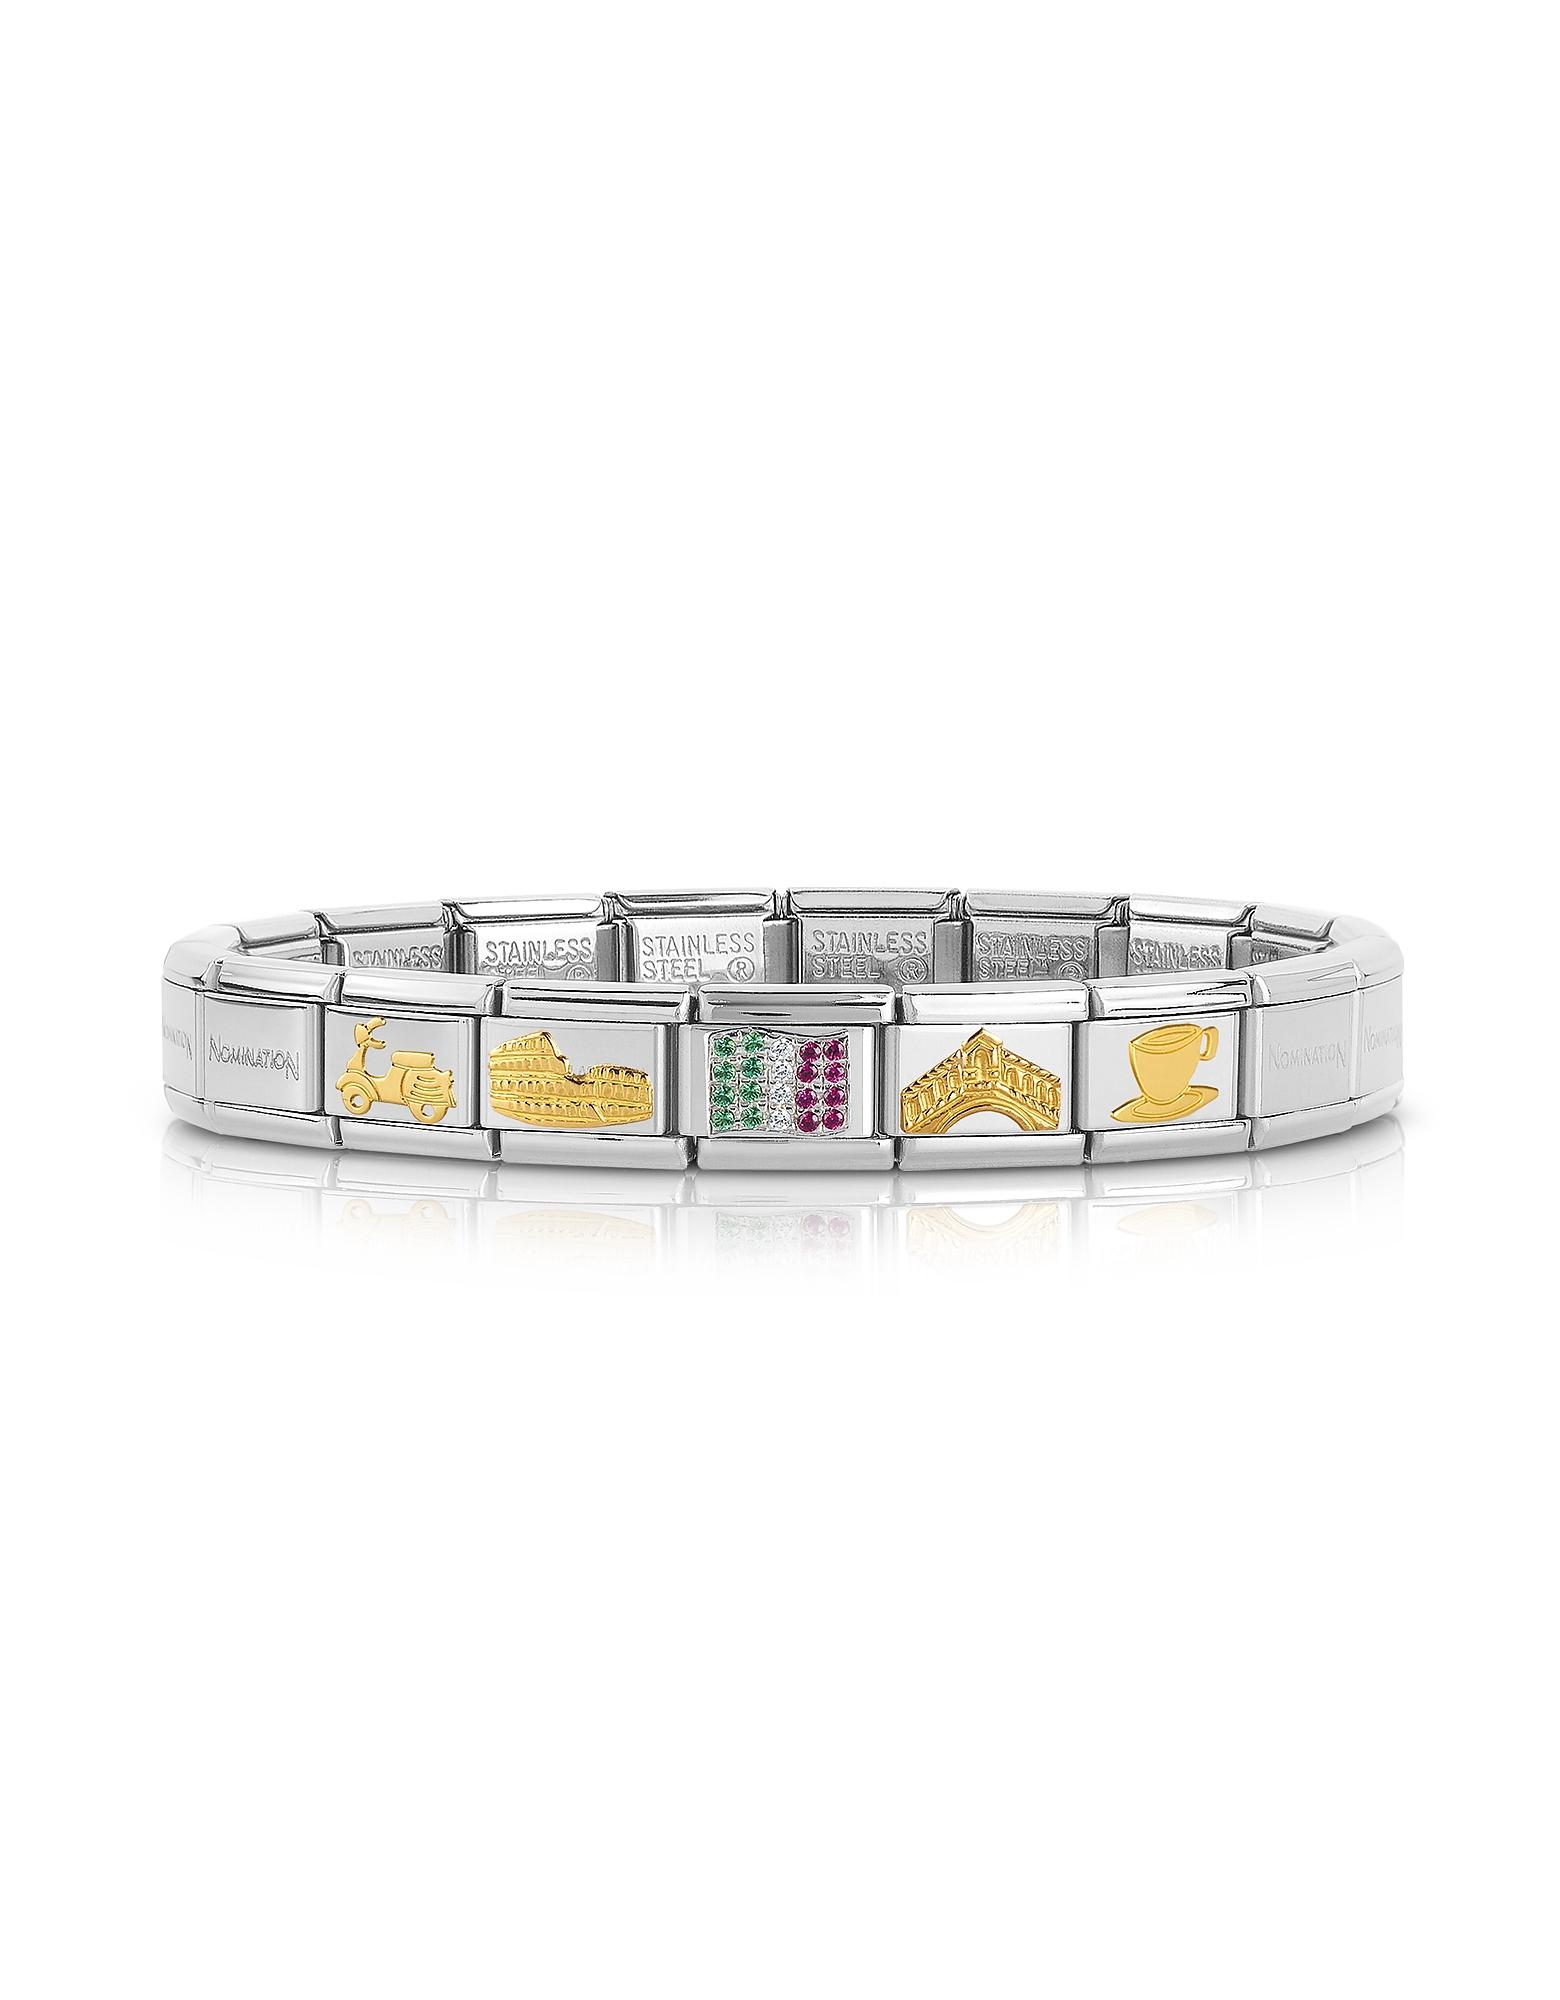 Nomination Bracelets, Classic Italia Golden Stainless Steel Bracelet w/Cubic Zirconia Italian Flag